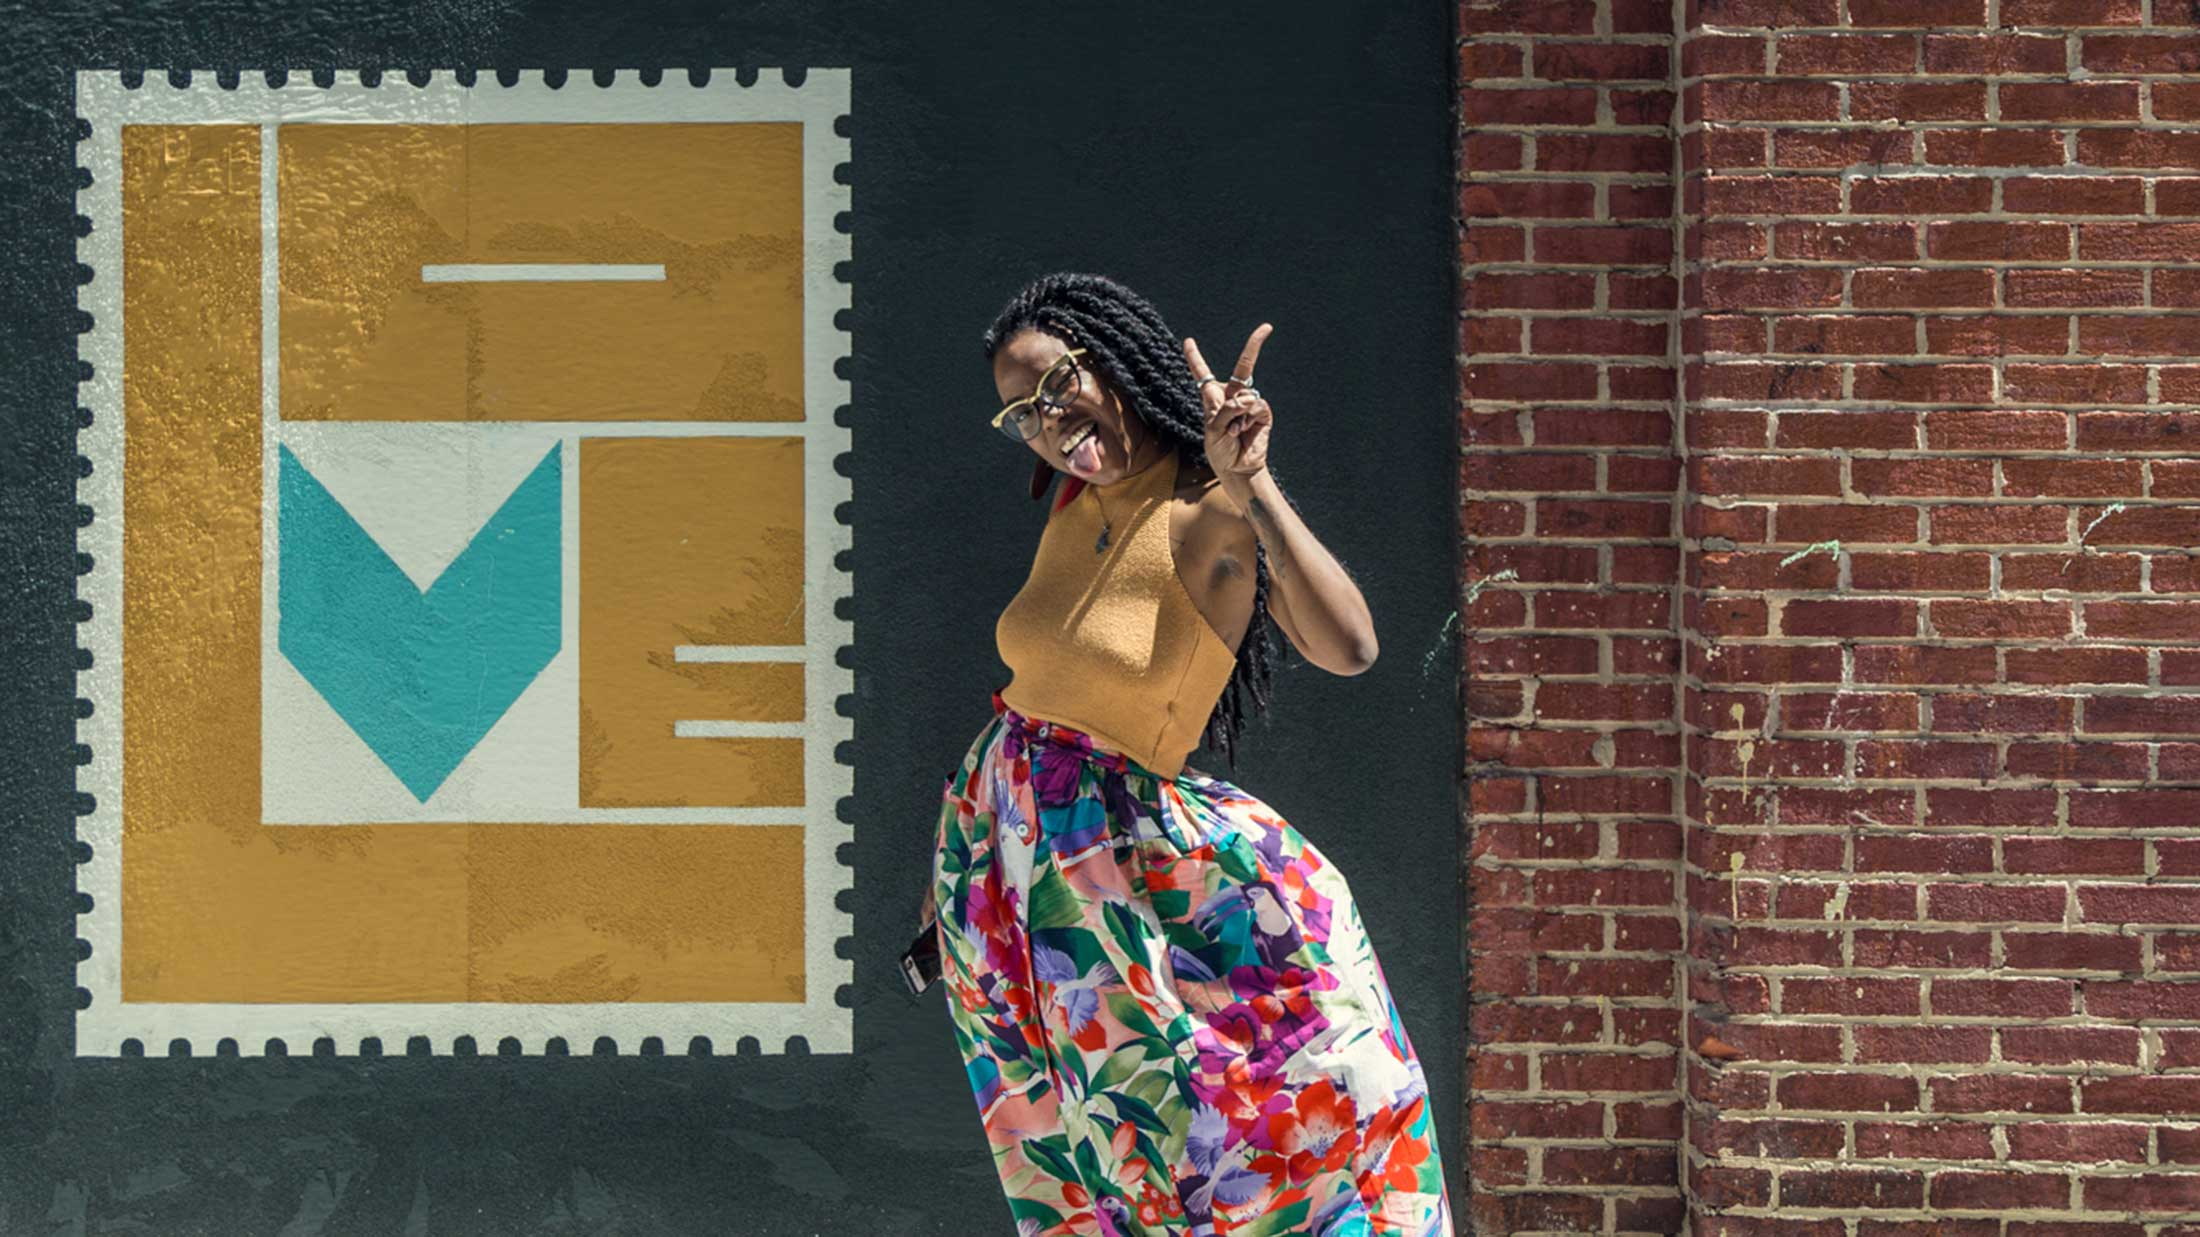 Uwishunu: The Best Things to Do in Philadelphia